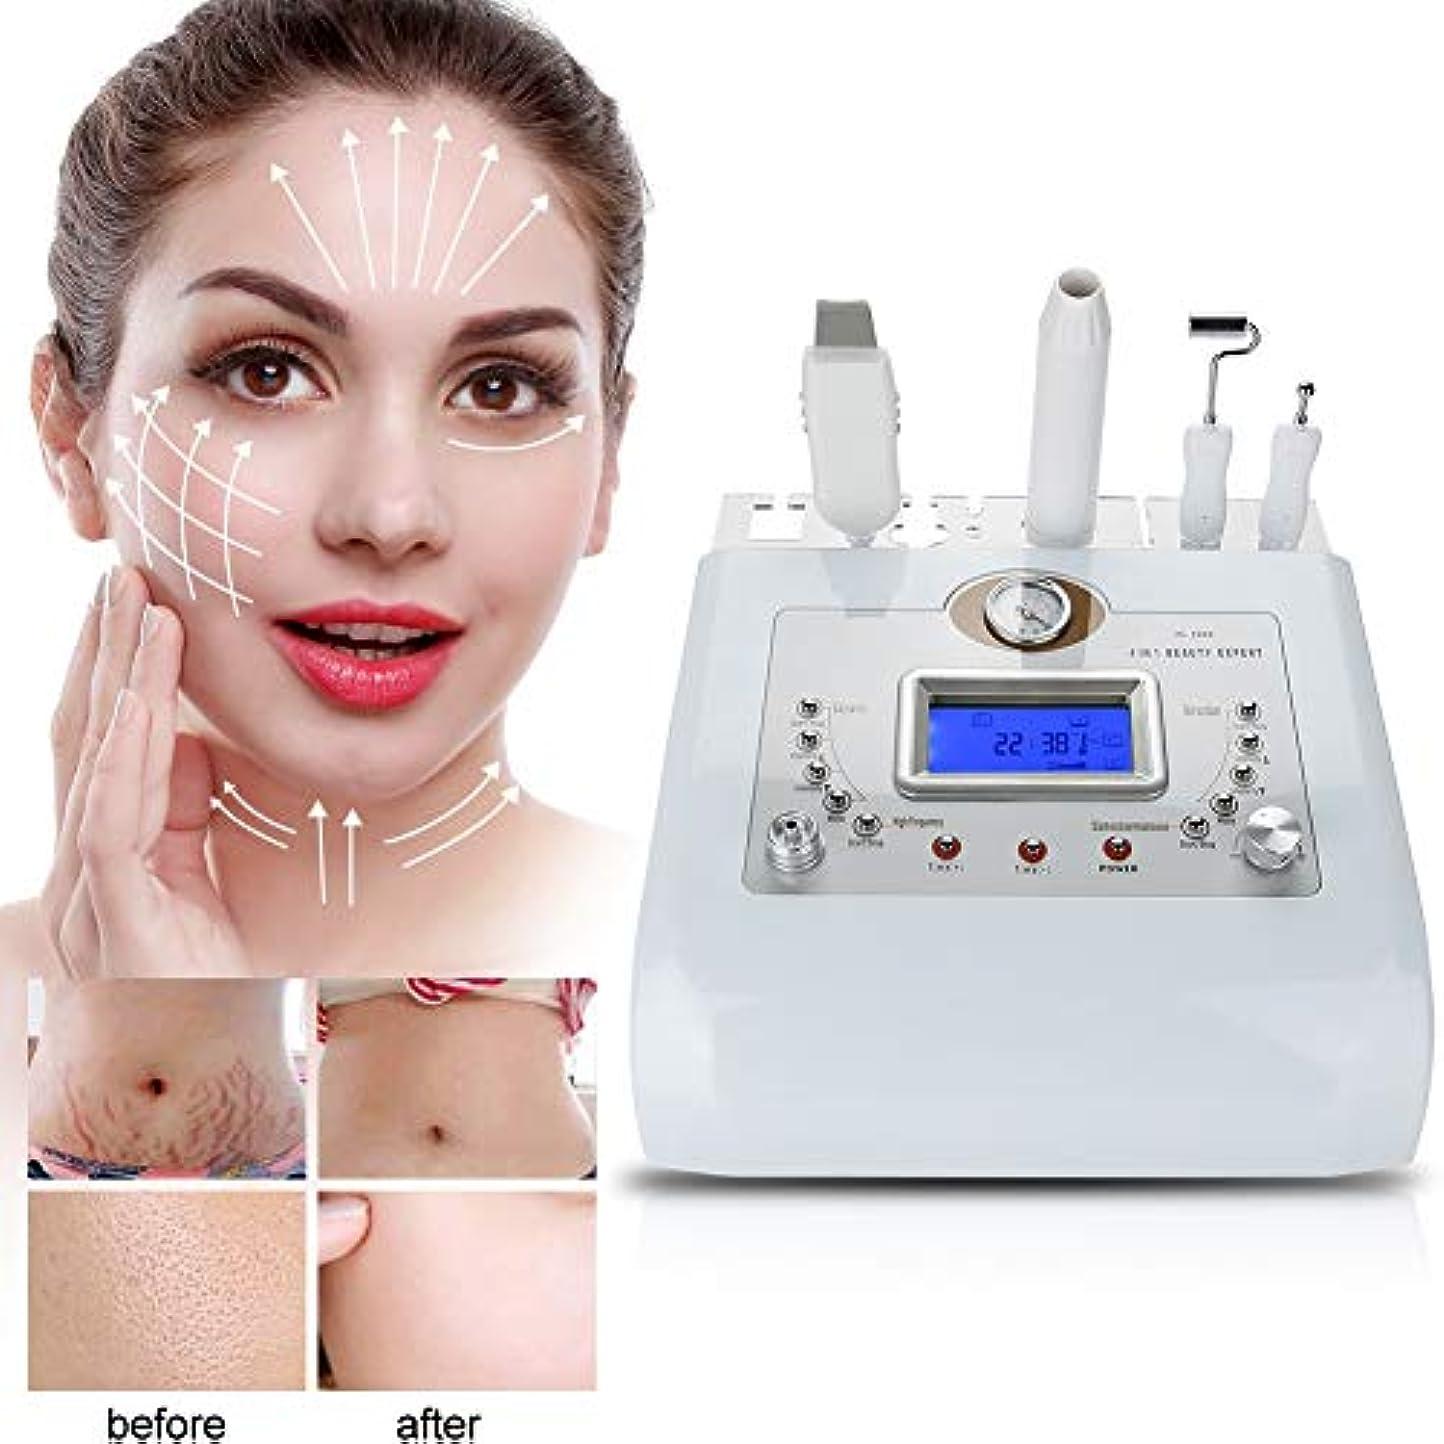 4-in-1ダイヤモンド皮膚剥離美容機、SPA用美容室用機器トナー、RF +超音波+スキンスクラバー+ EMS電気治療 (白)